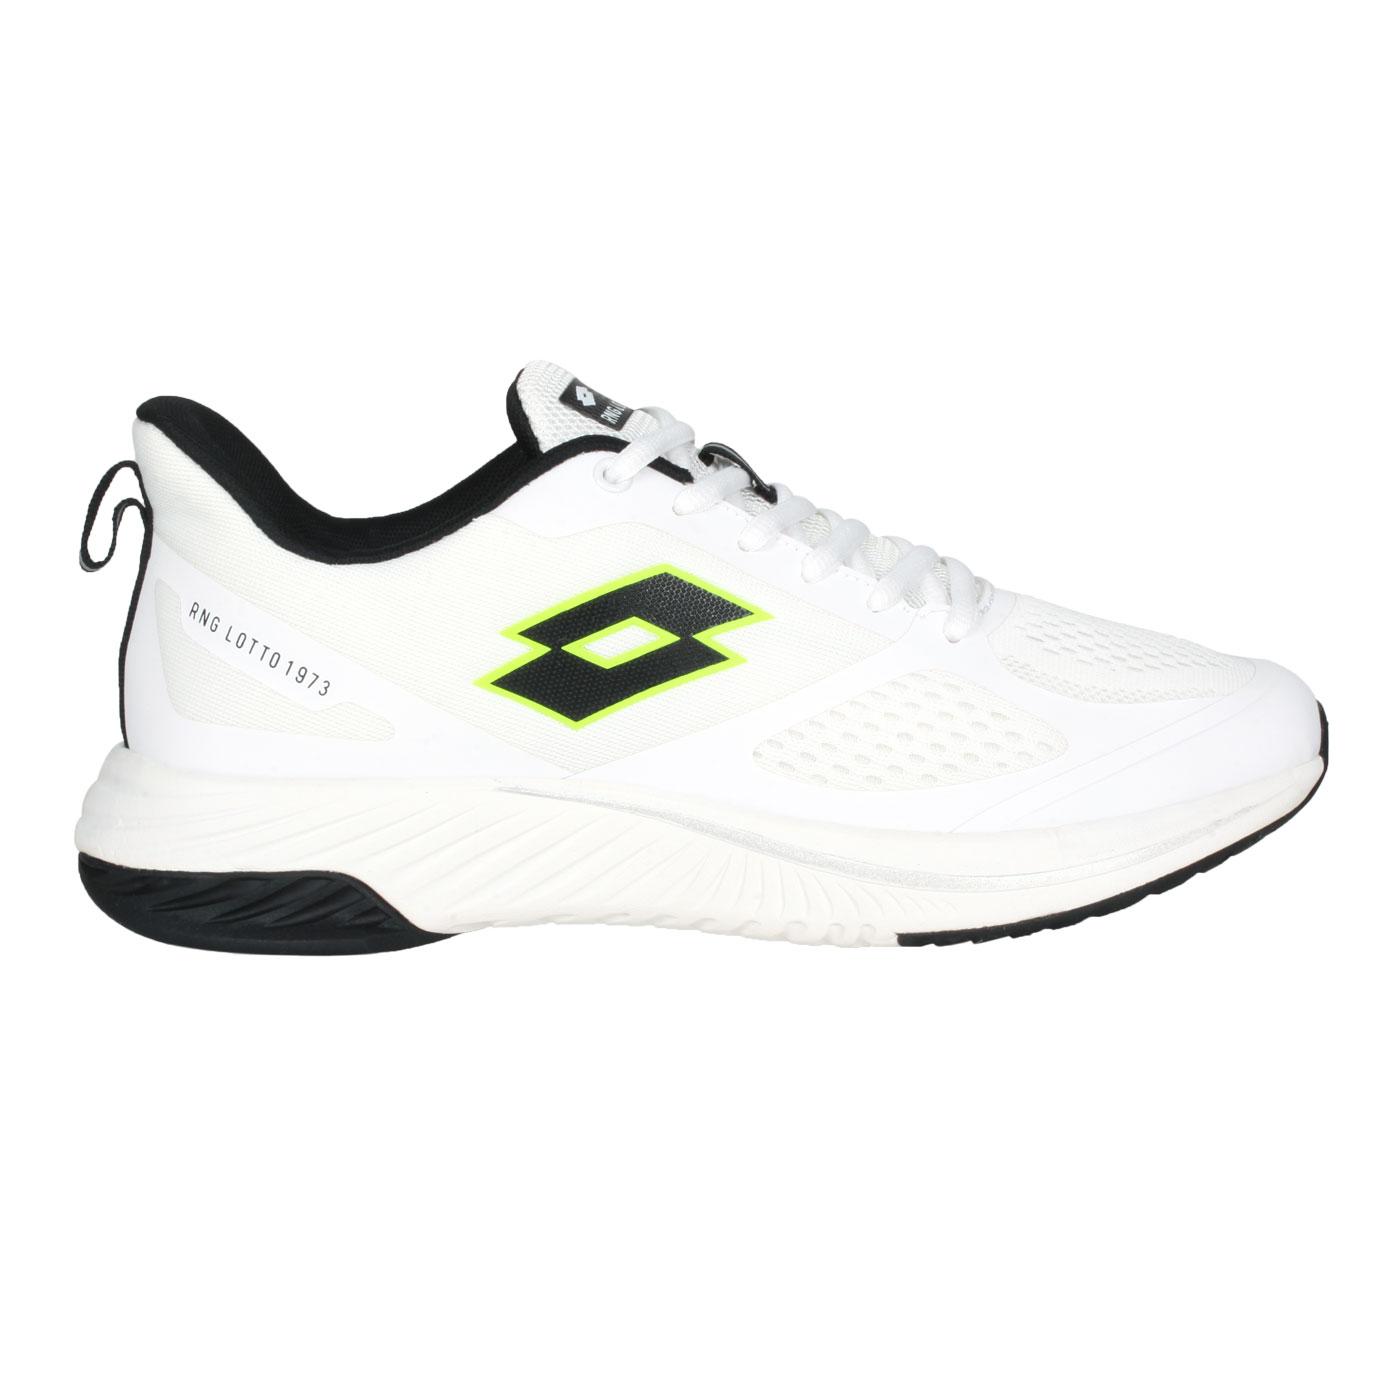 LOTTO 男款避震跑鞋 LT1AMR3559 - 白黑螢光綠